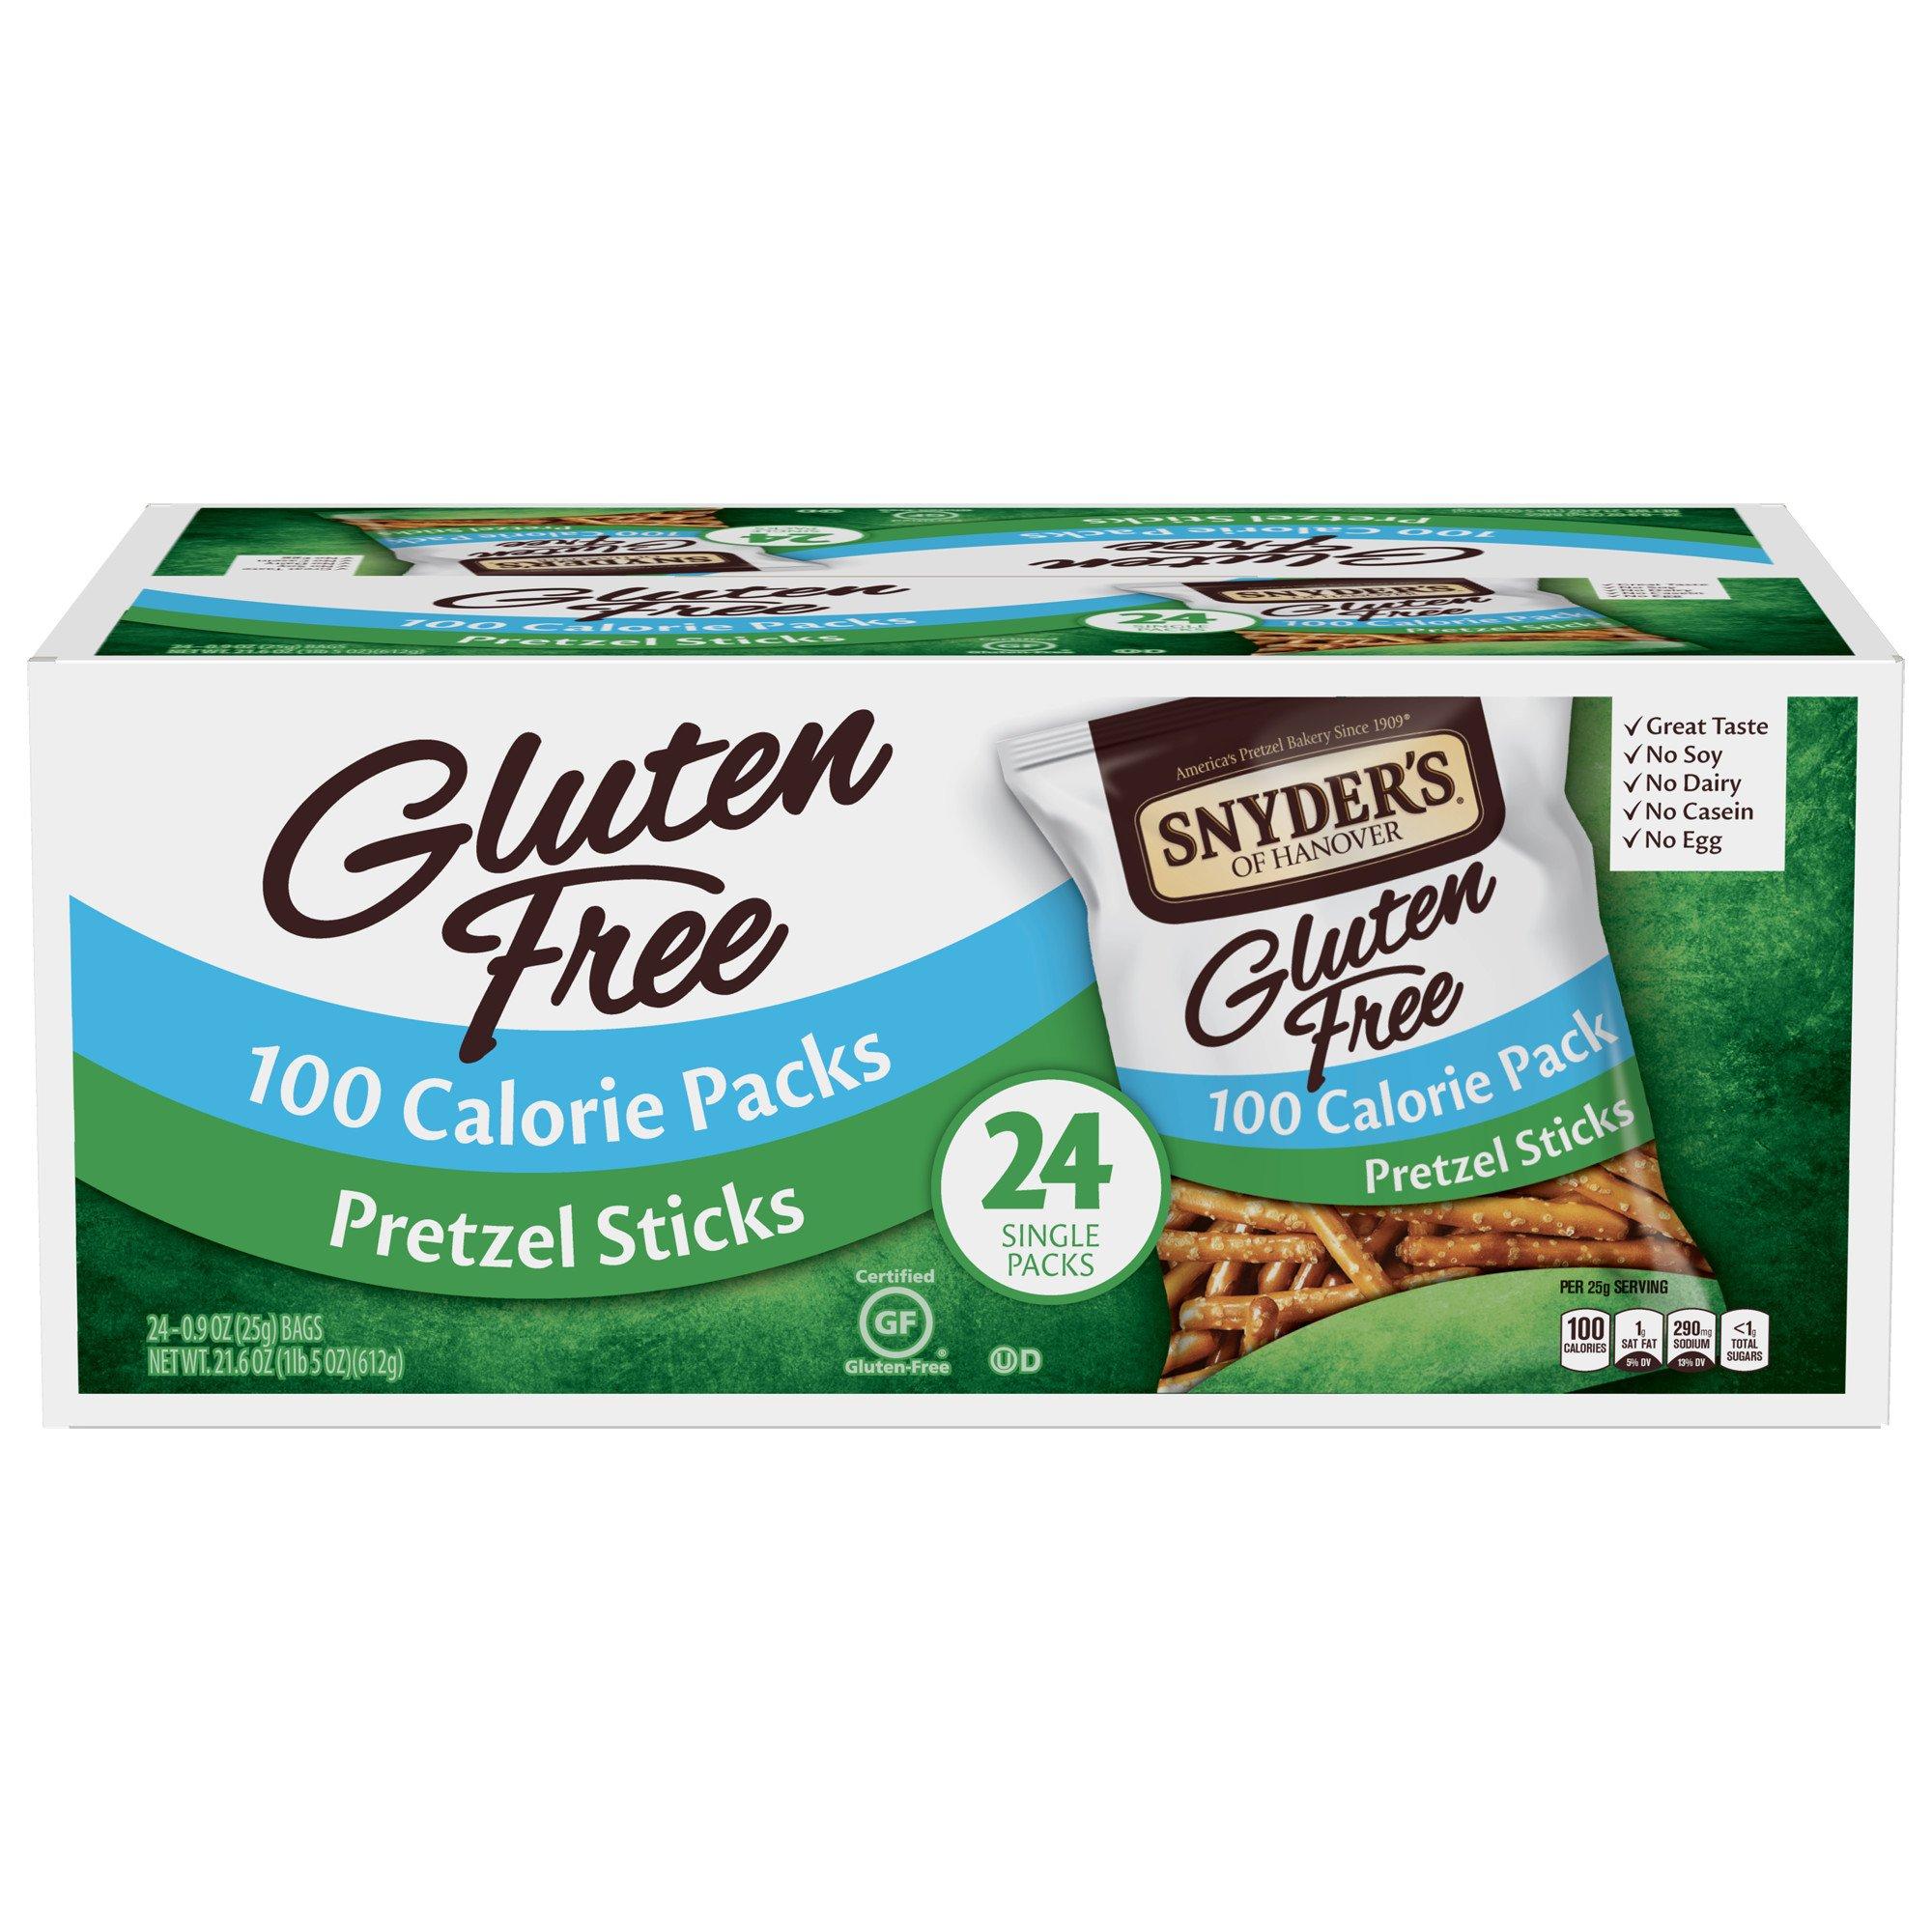 Snyder's of Hanover Gluten Free Pretzel Sticks 100 Calorie Packs, 24 Count